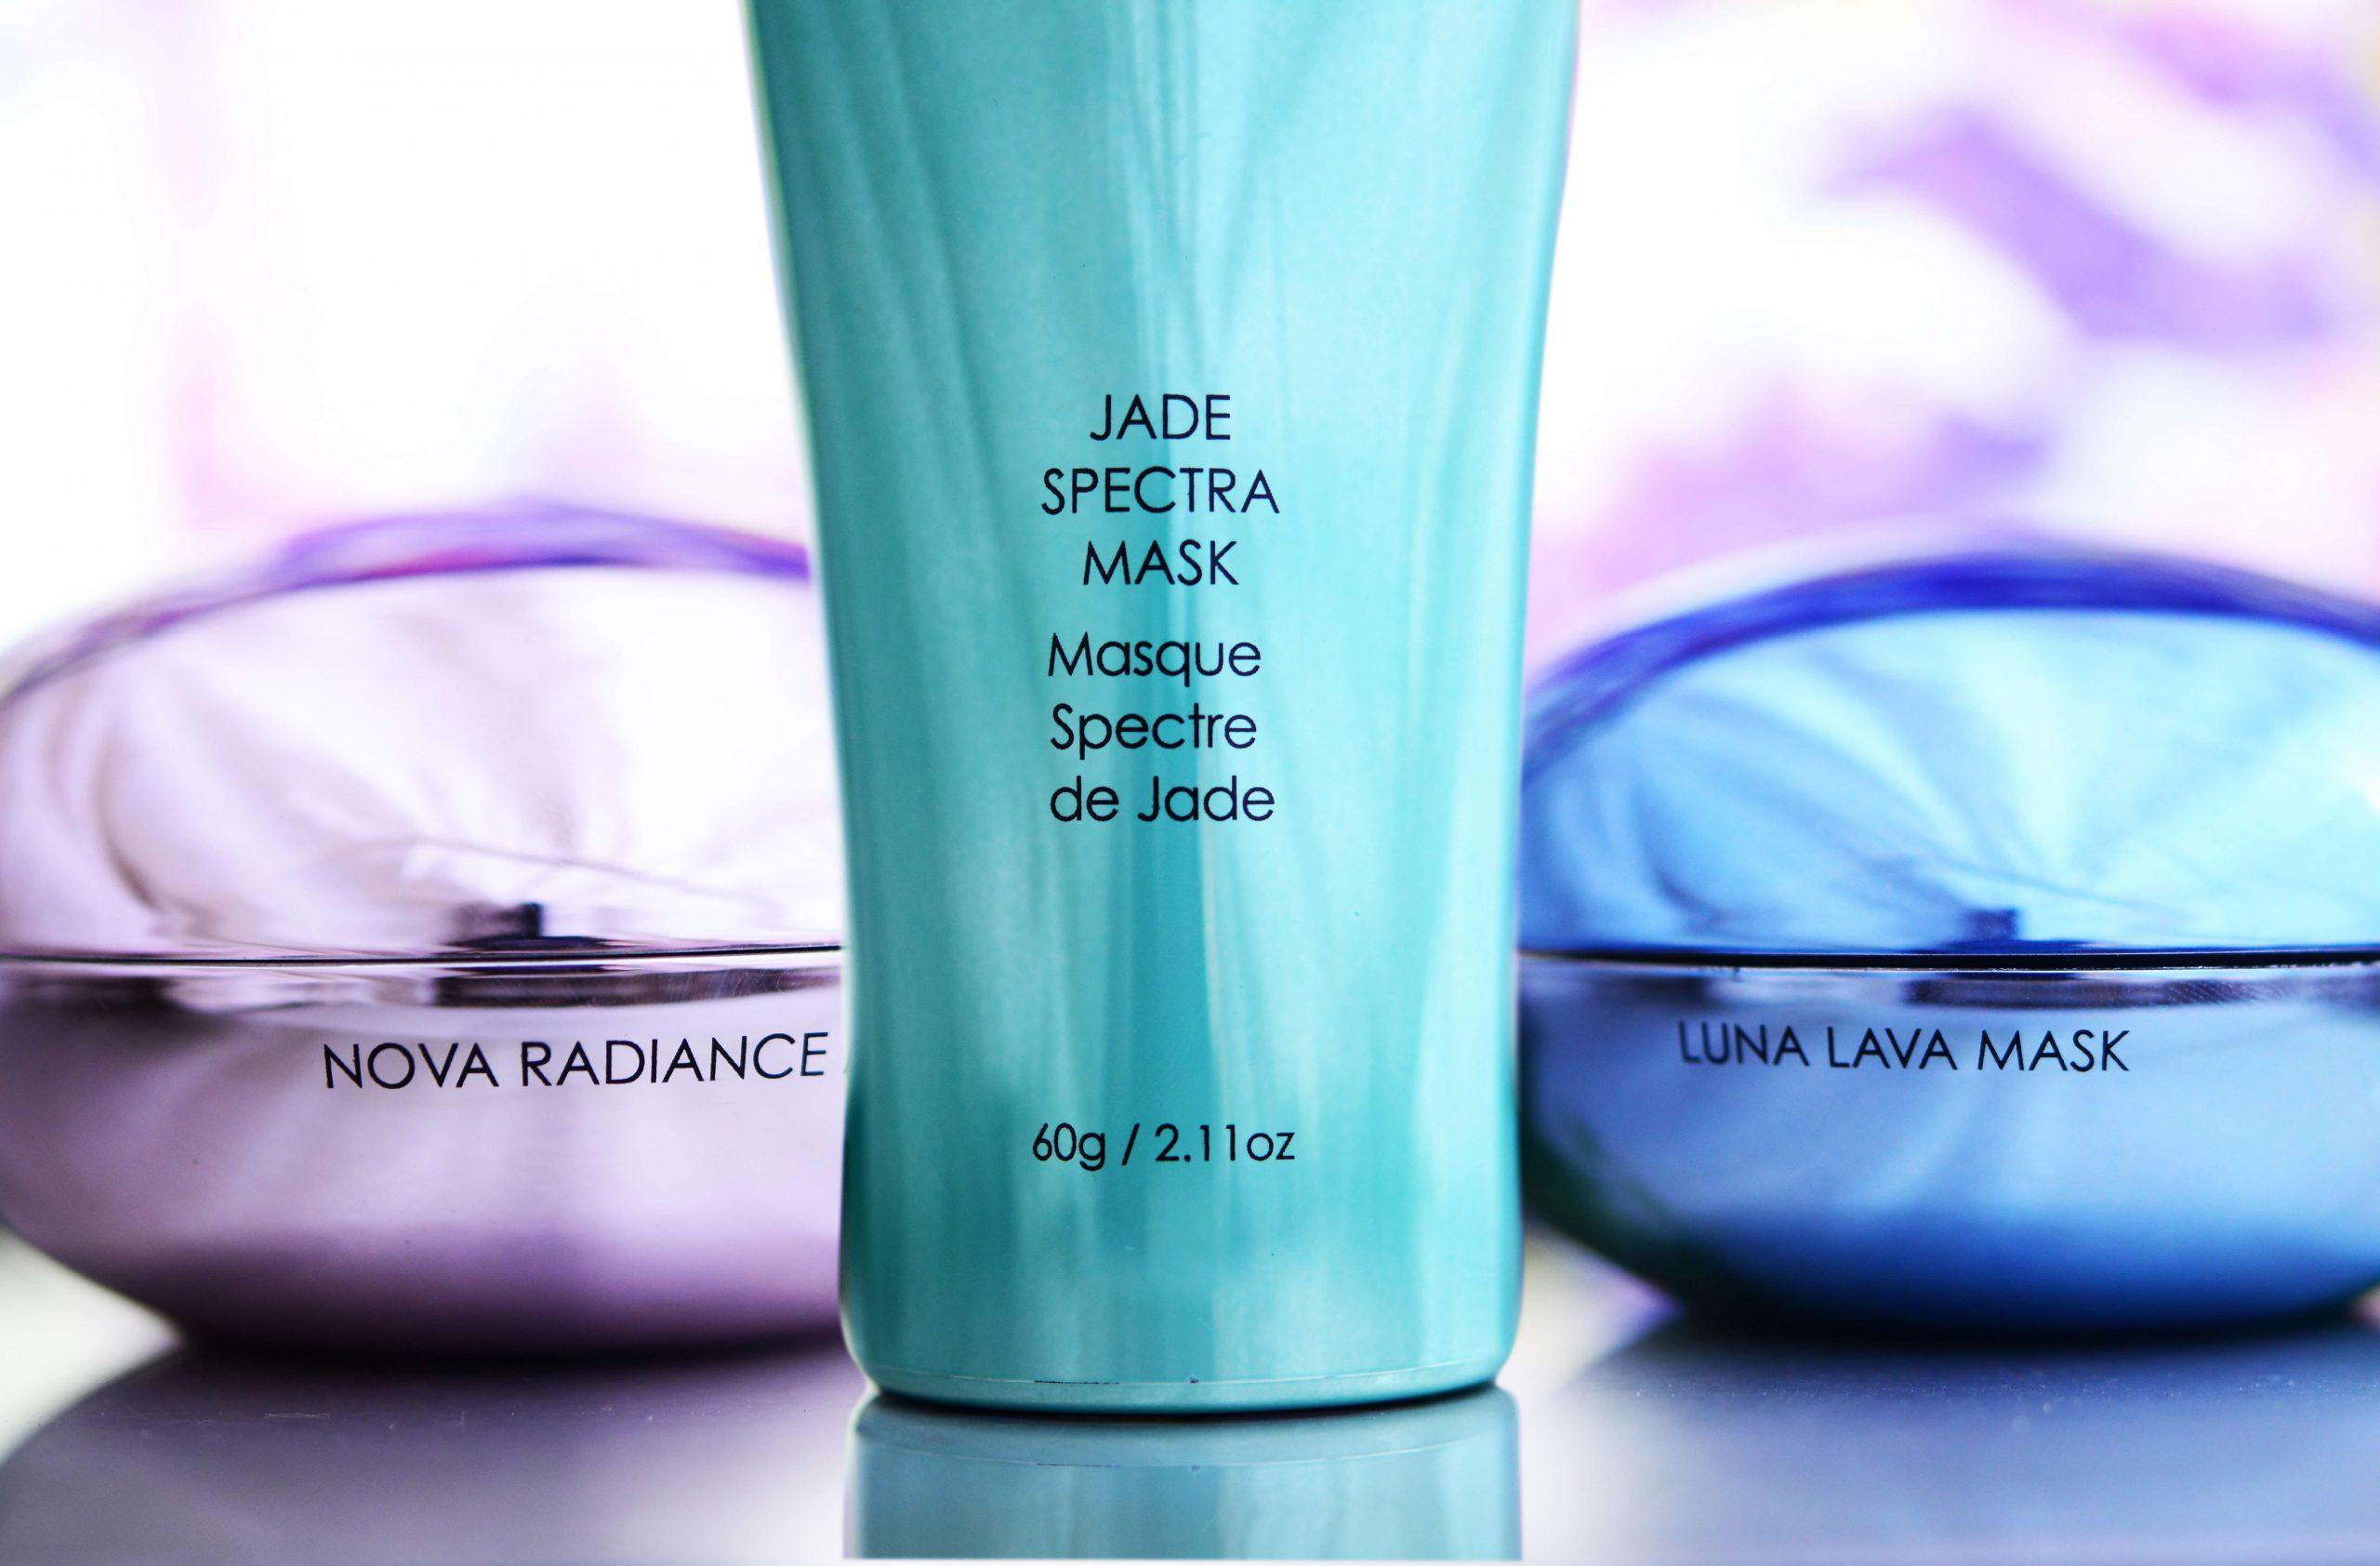 Jade Spectra Mask